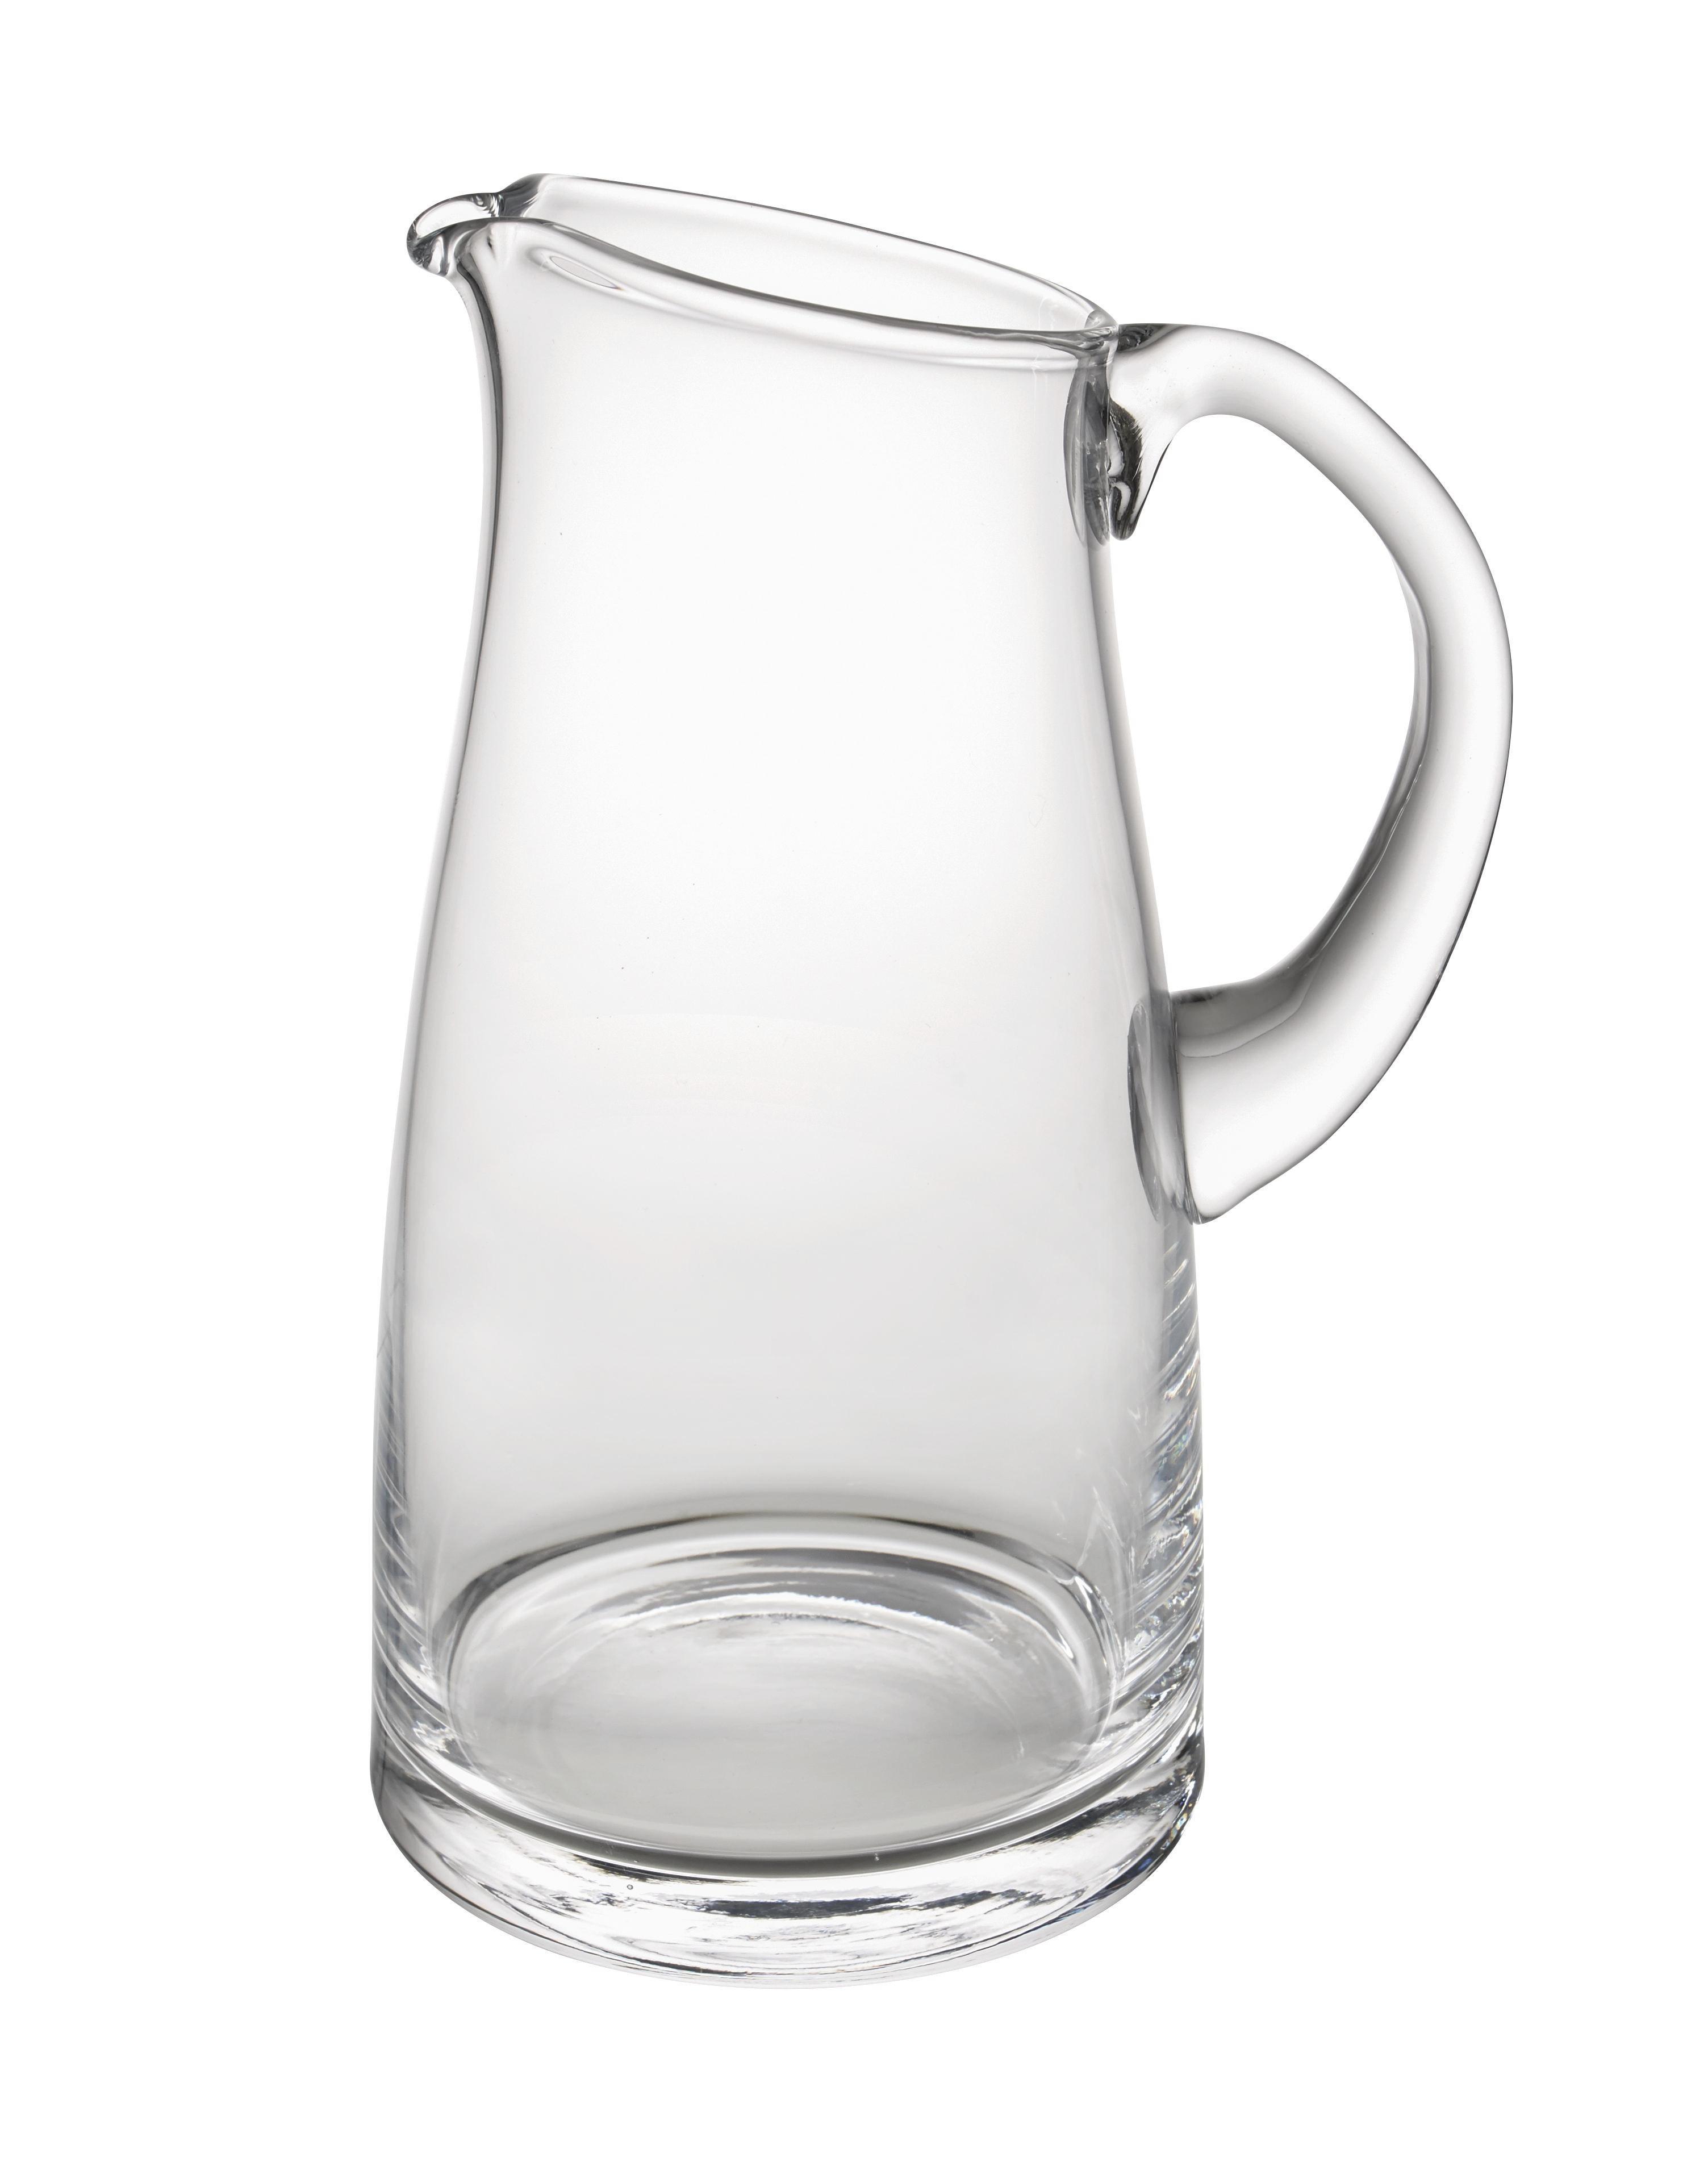 GLASKRUG  1,2 L - Klar, Basics, Glas (16.5/21/11.5cm) - LEONARDO